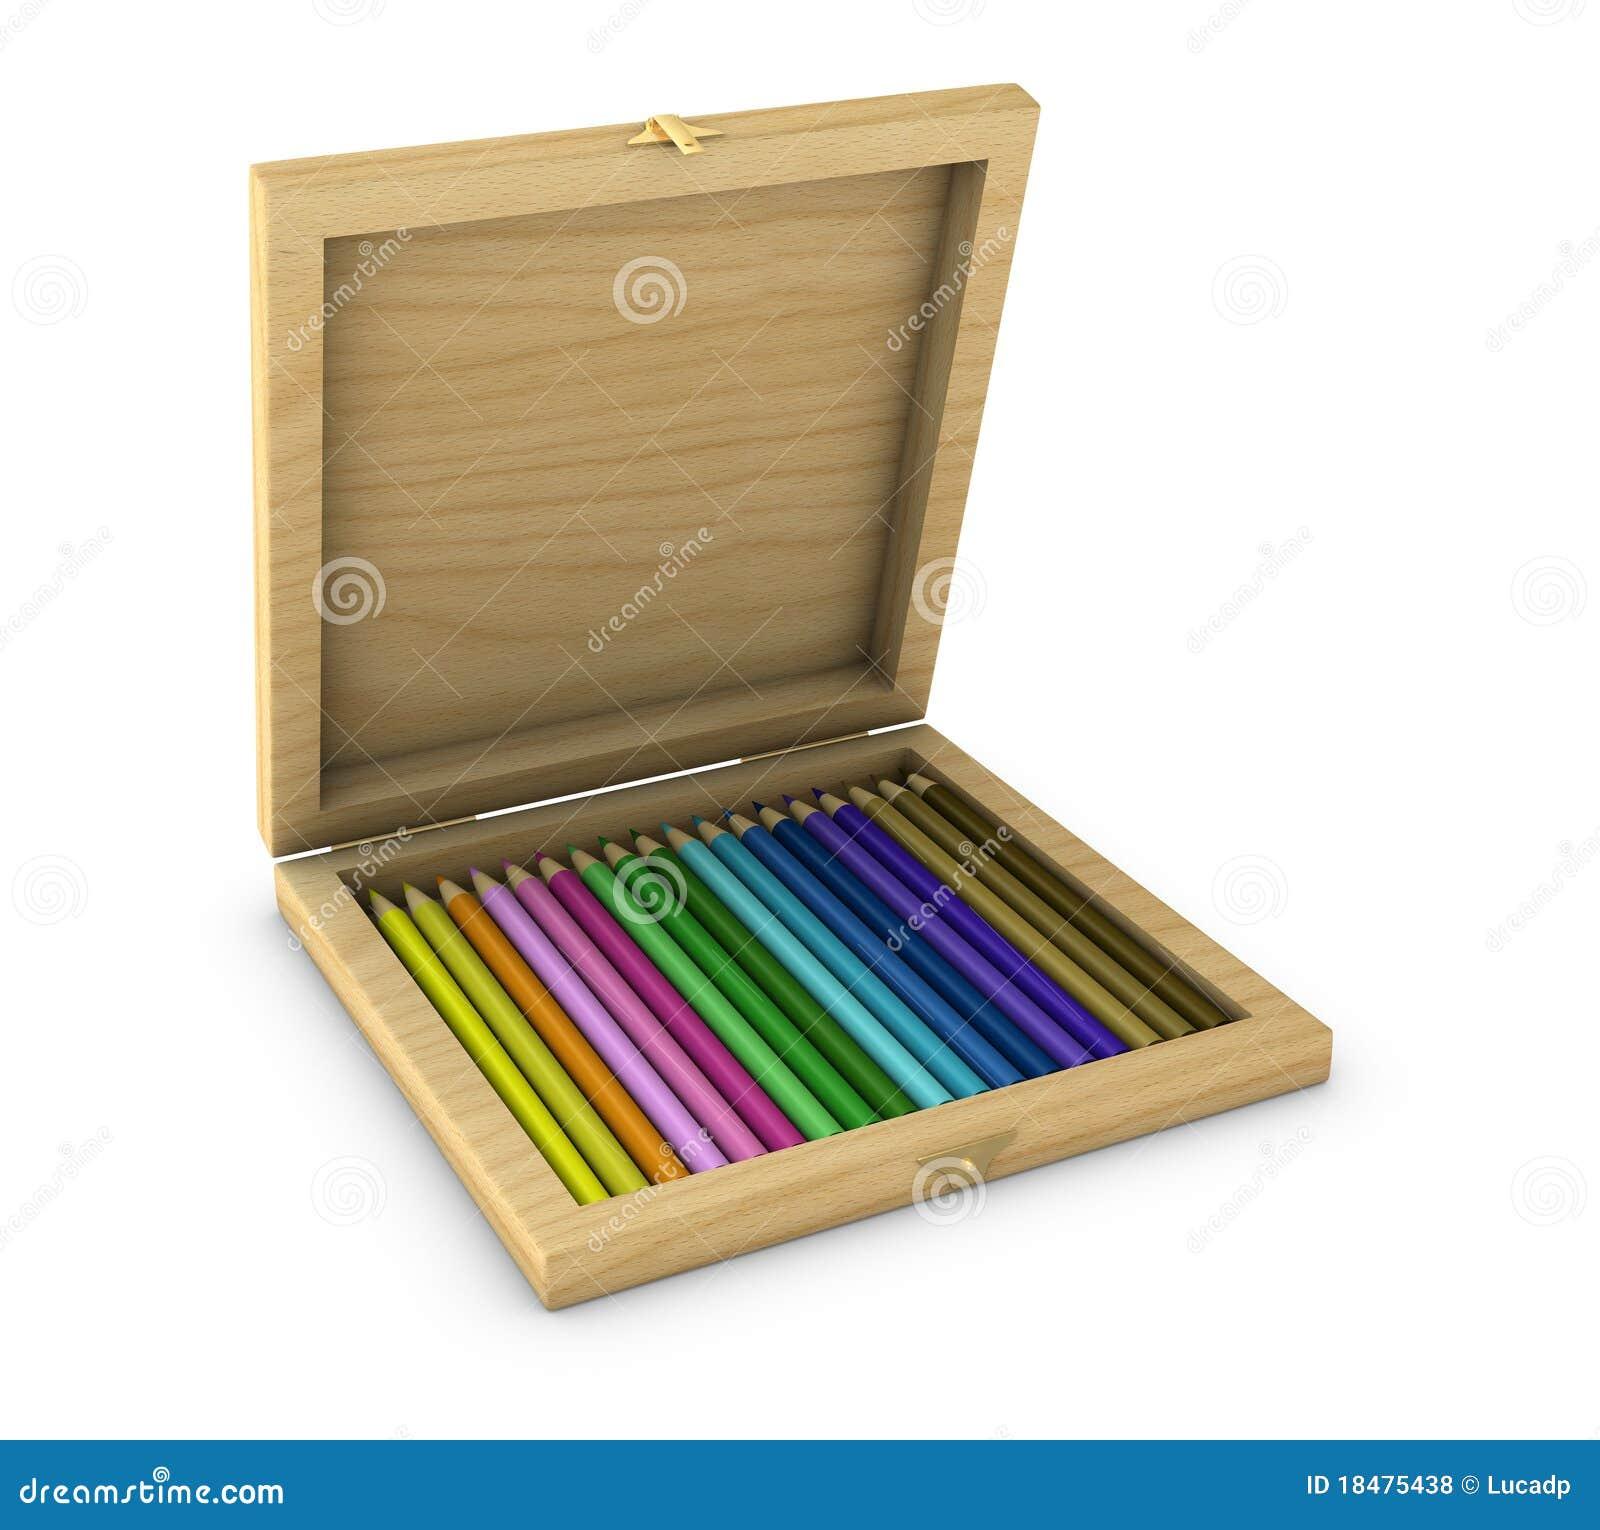 Box Of Colored Pencils : Box of colored pencils royalty free stock photos image